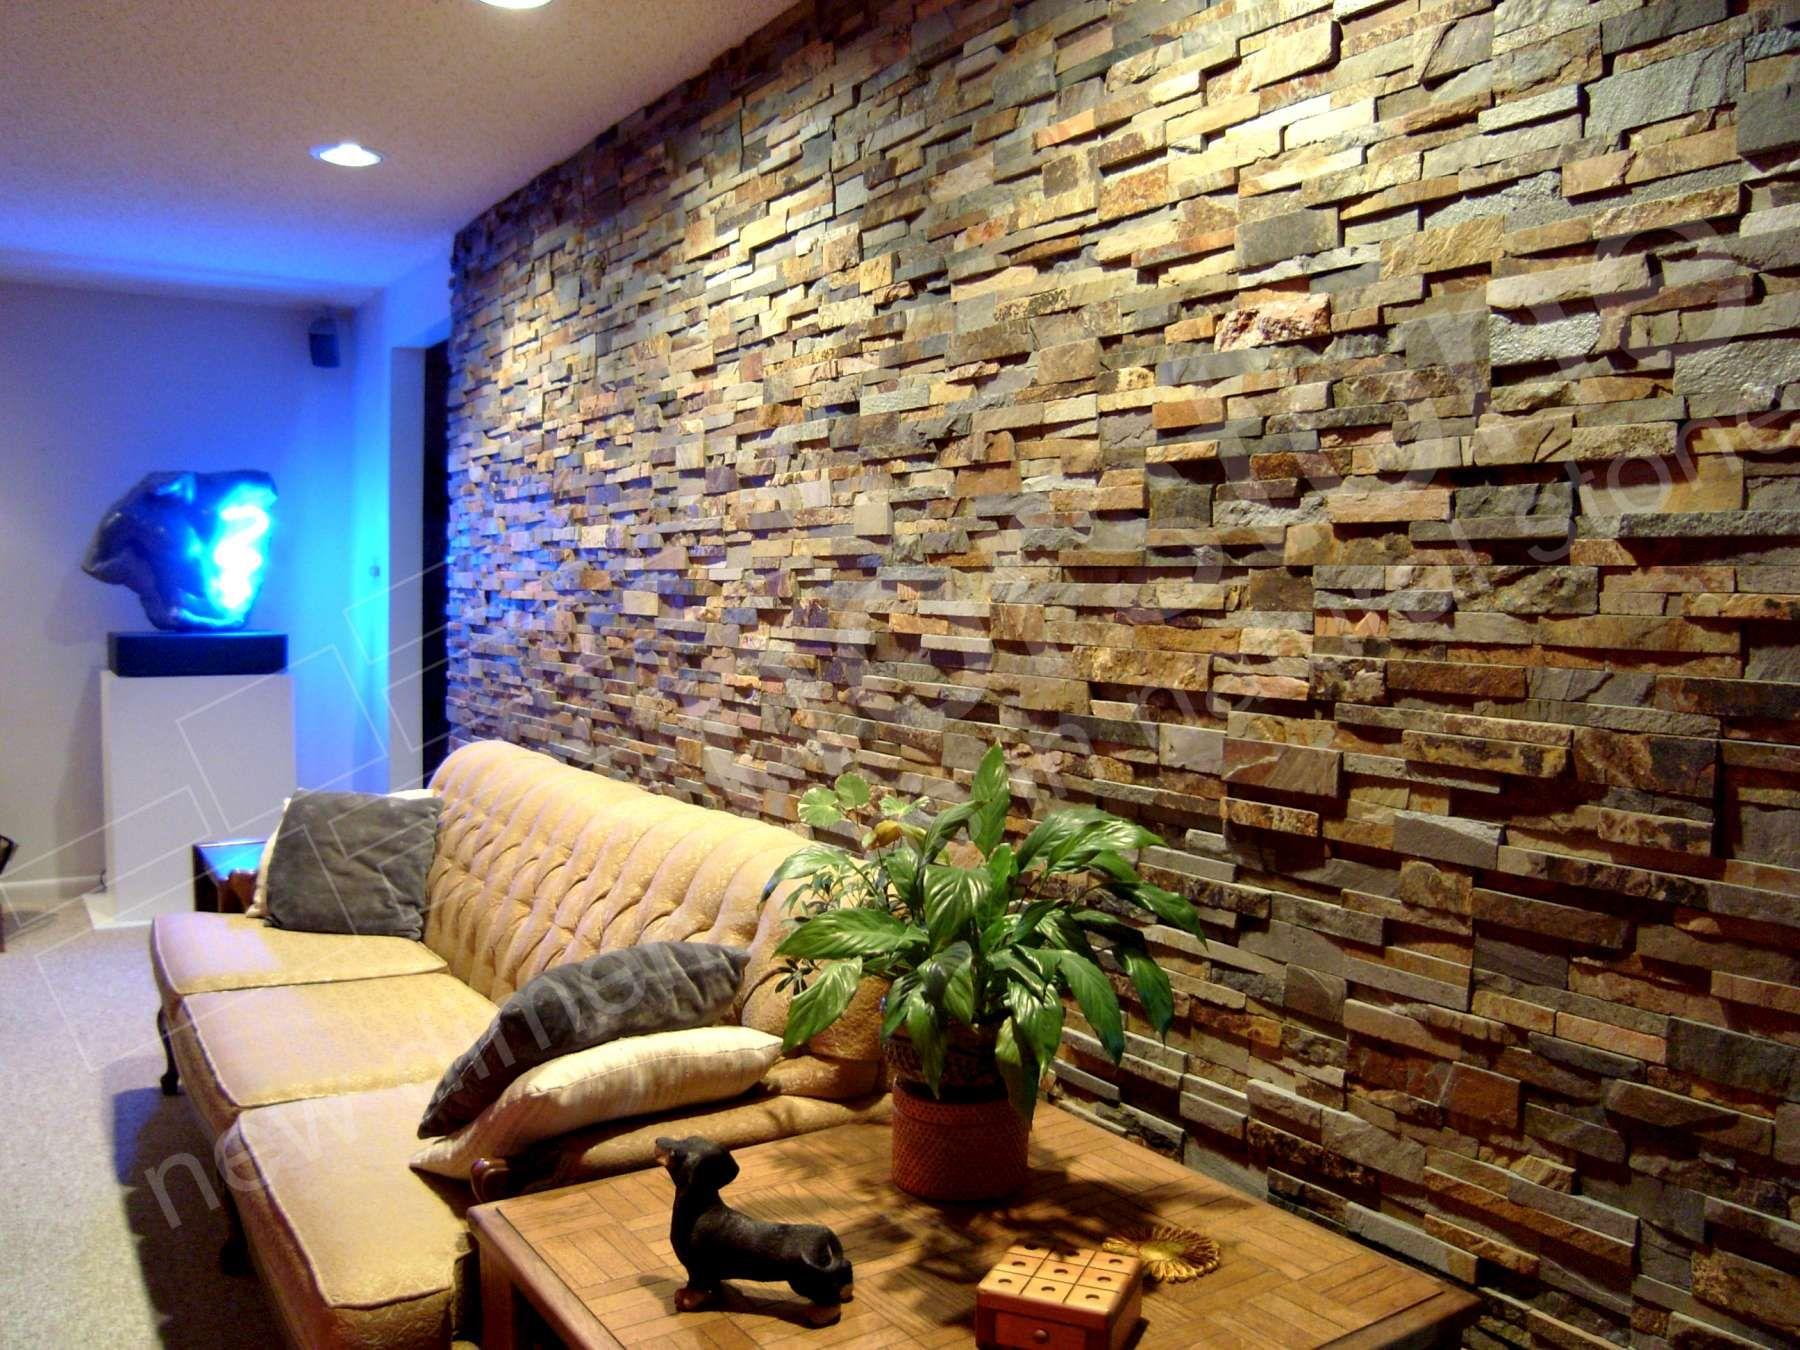 Norstone Natural Stone Veneer Natural Stone Products Natural Stone Wall Stone Tile Wall Stone Walls Interior